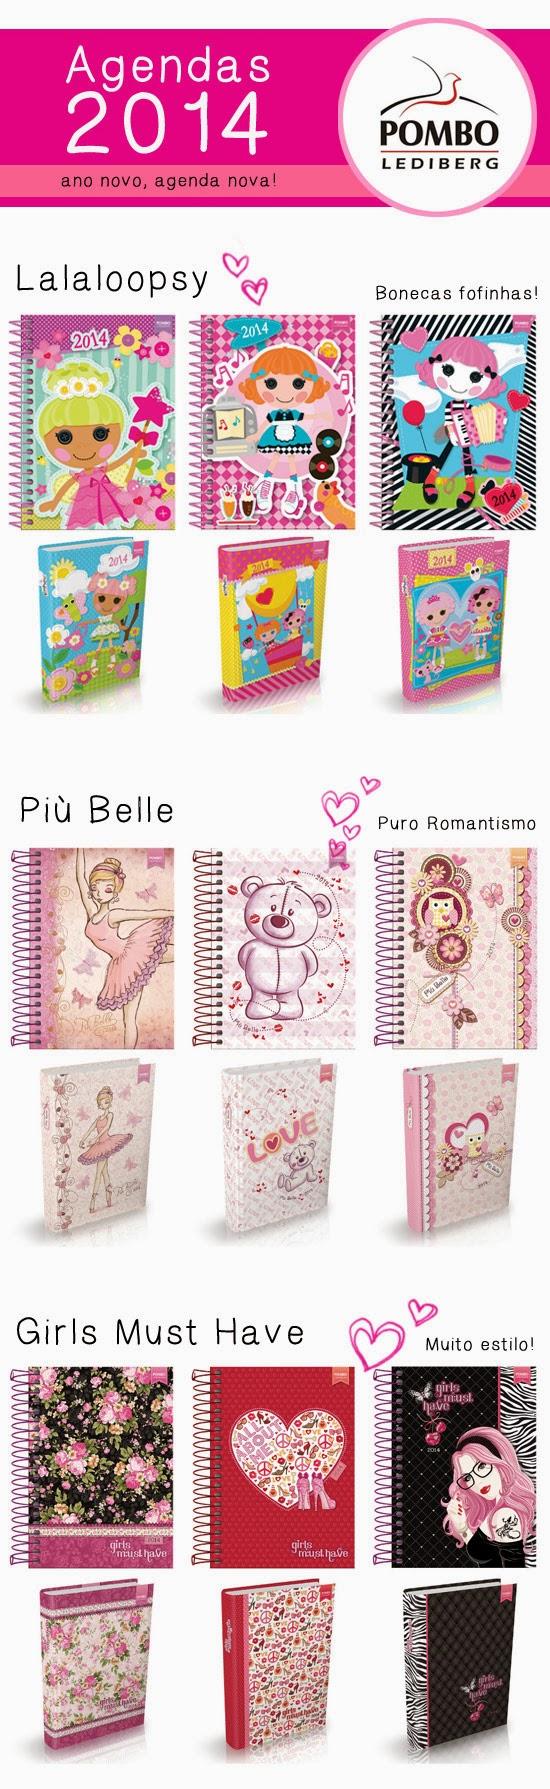 Sorteio 3 agendas Pombo Lediberg e I Love Pink